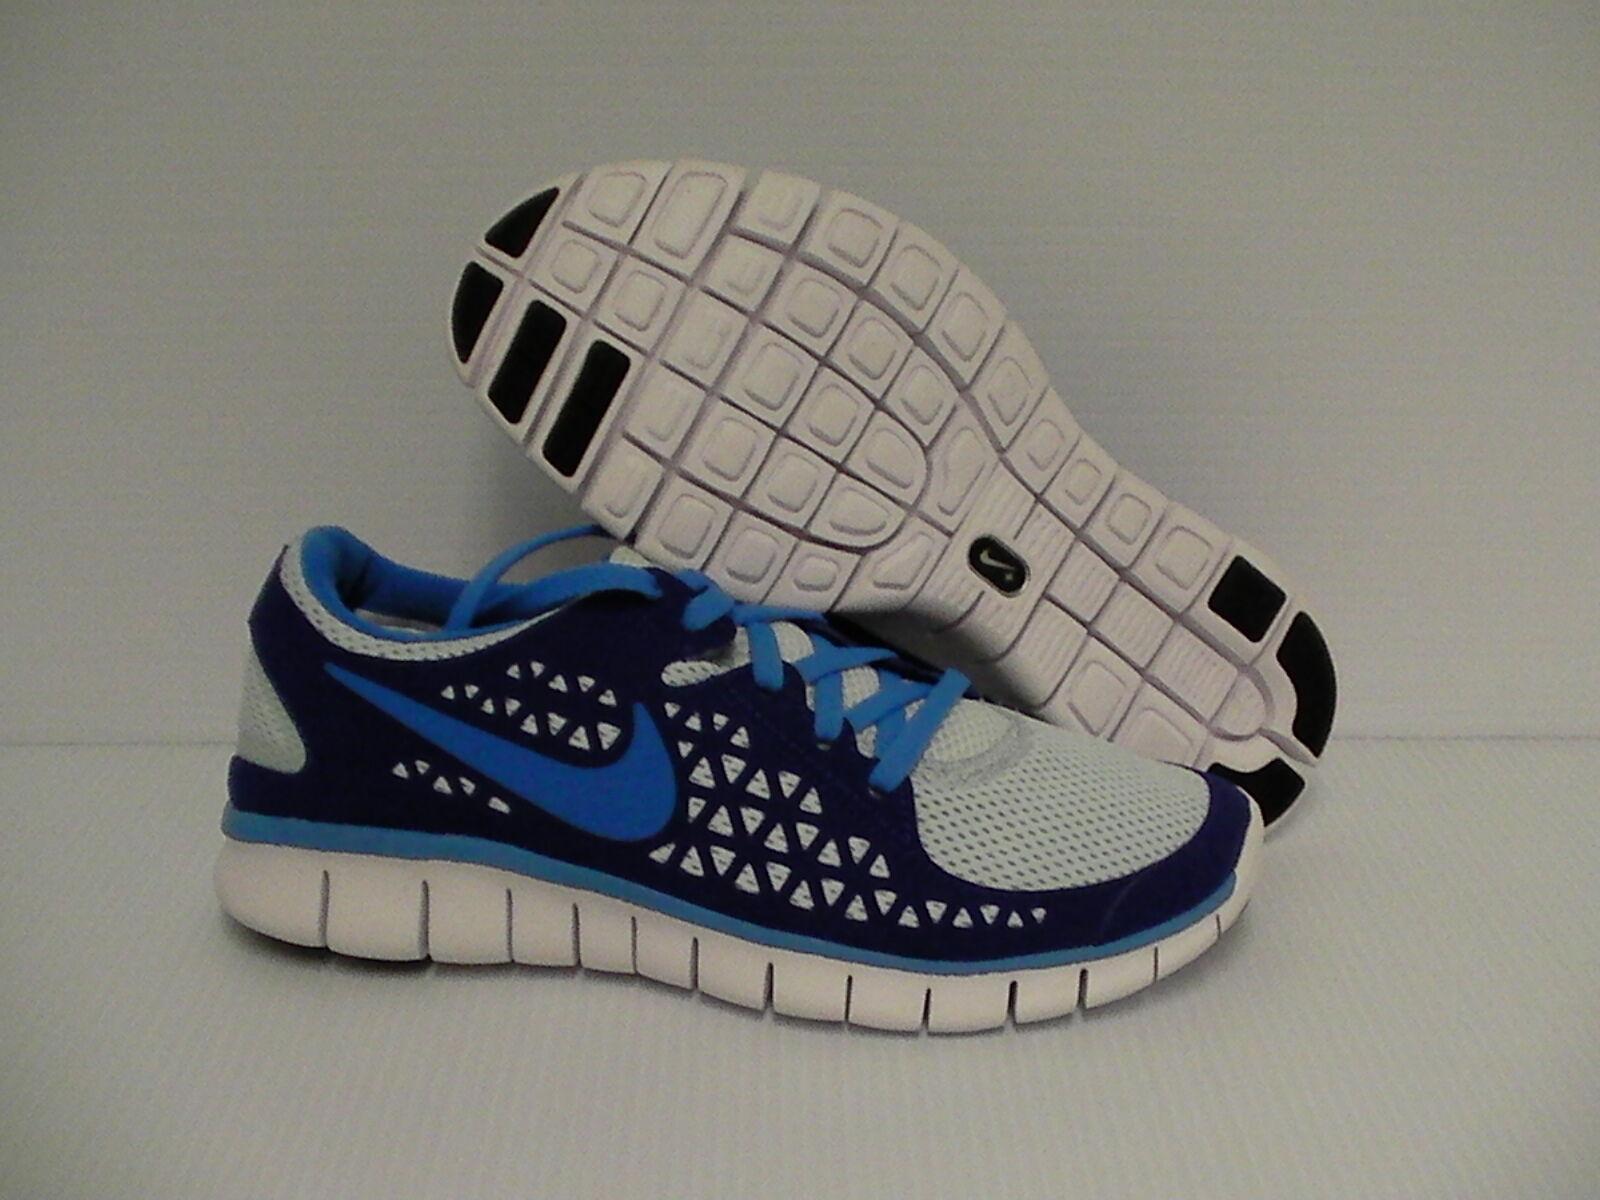 Damen Nike Free Run Laufschuhe Größe 8,5 8,5 8,5 Us e3aa72